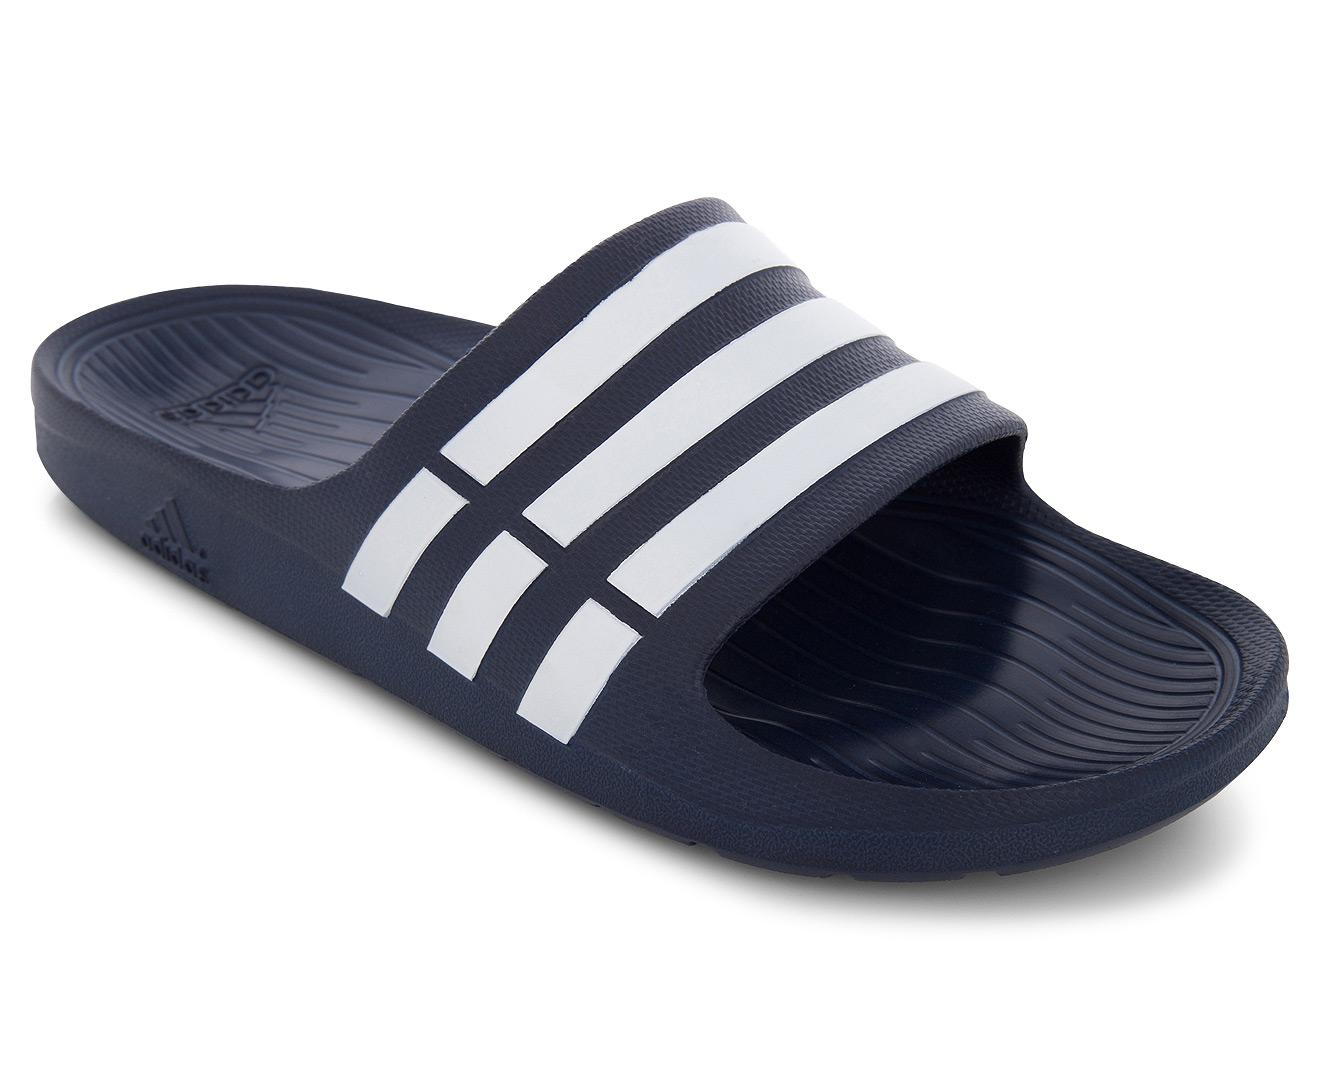 ada7d660bd64 Adidas Unisex Duramo Slide - Navy White